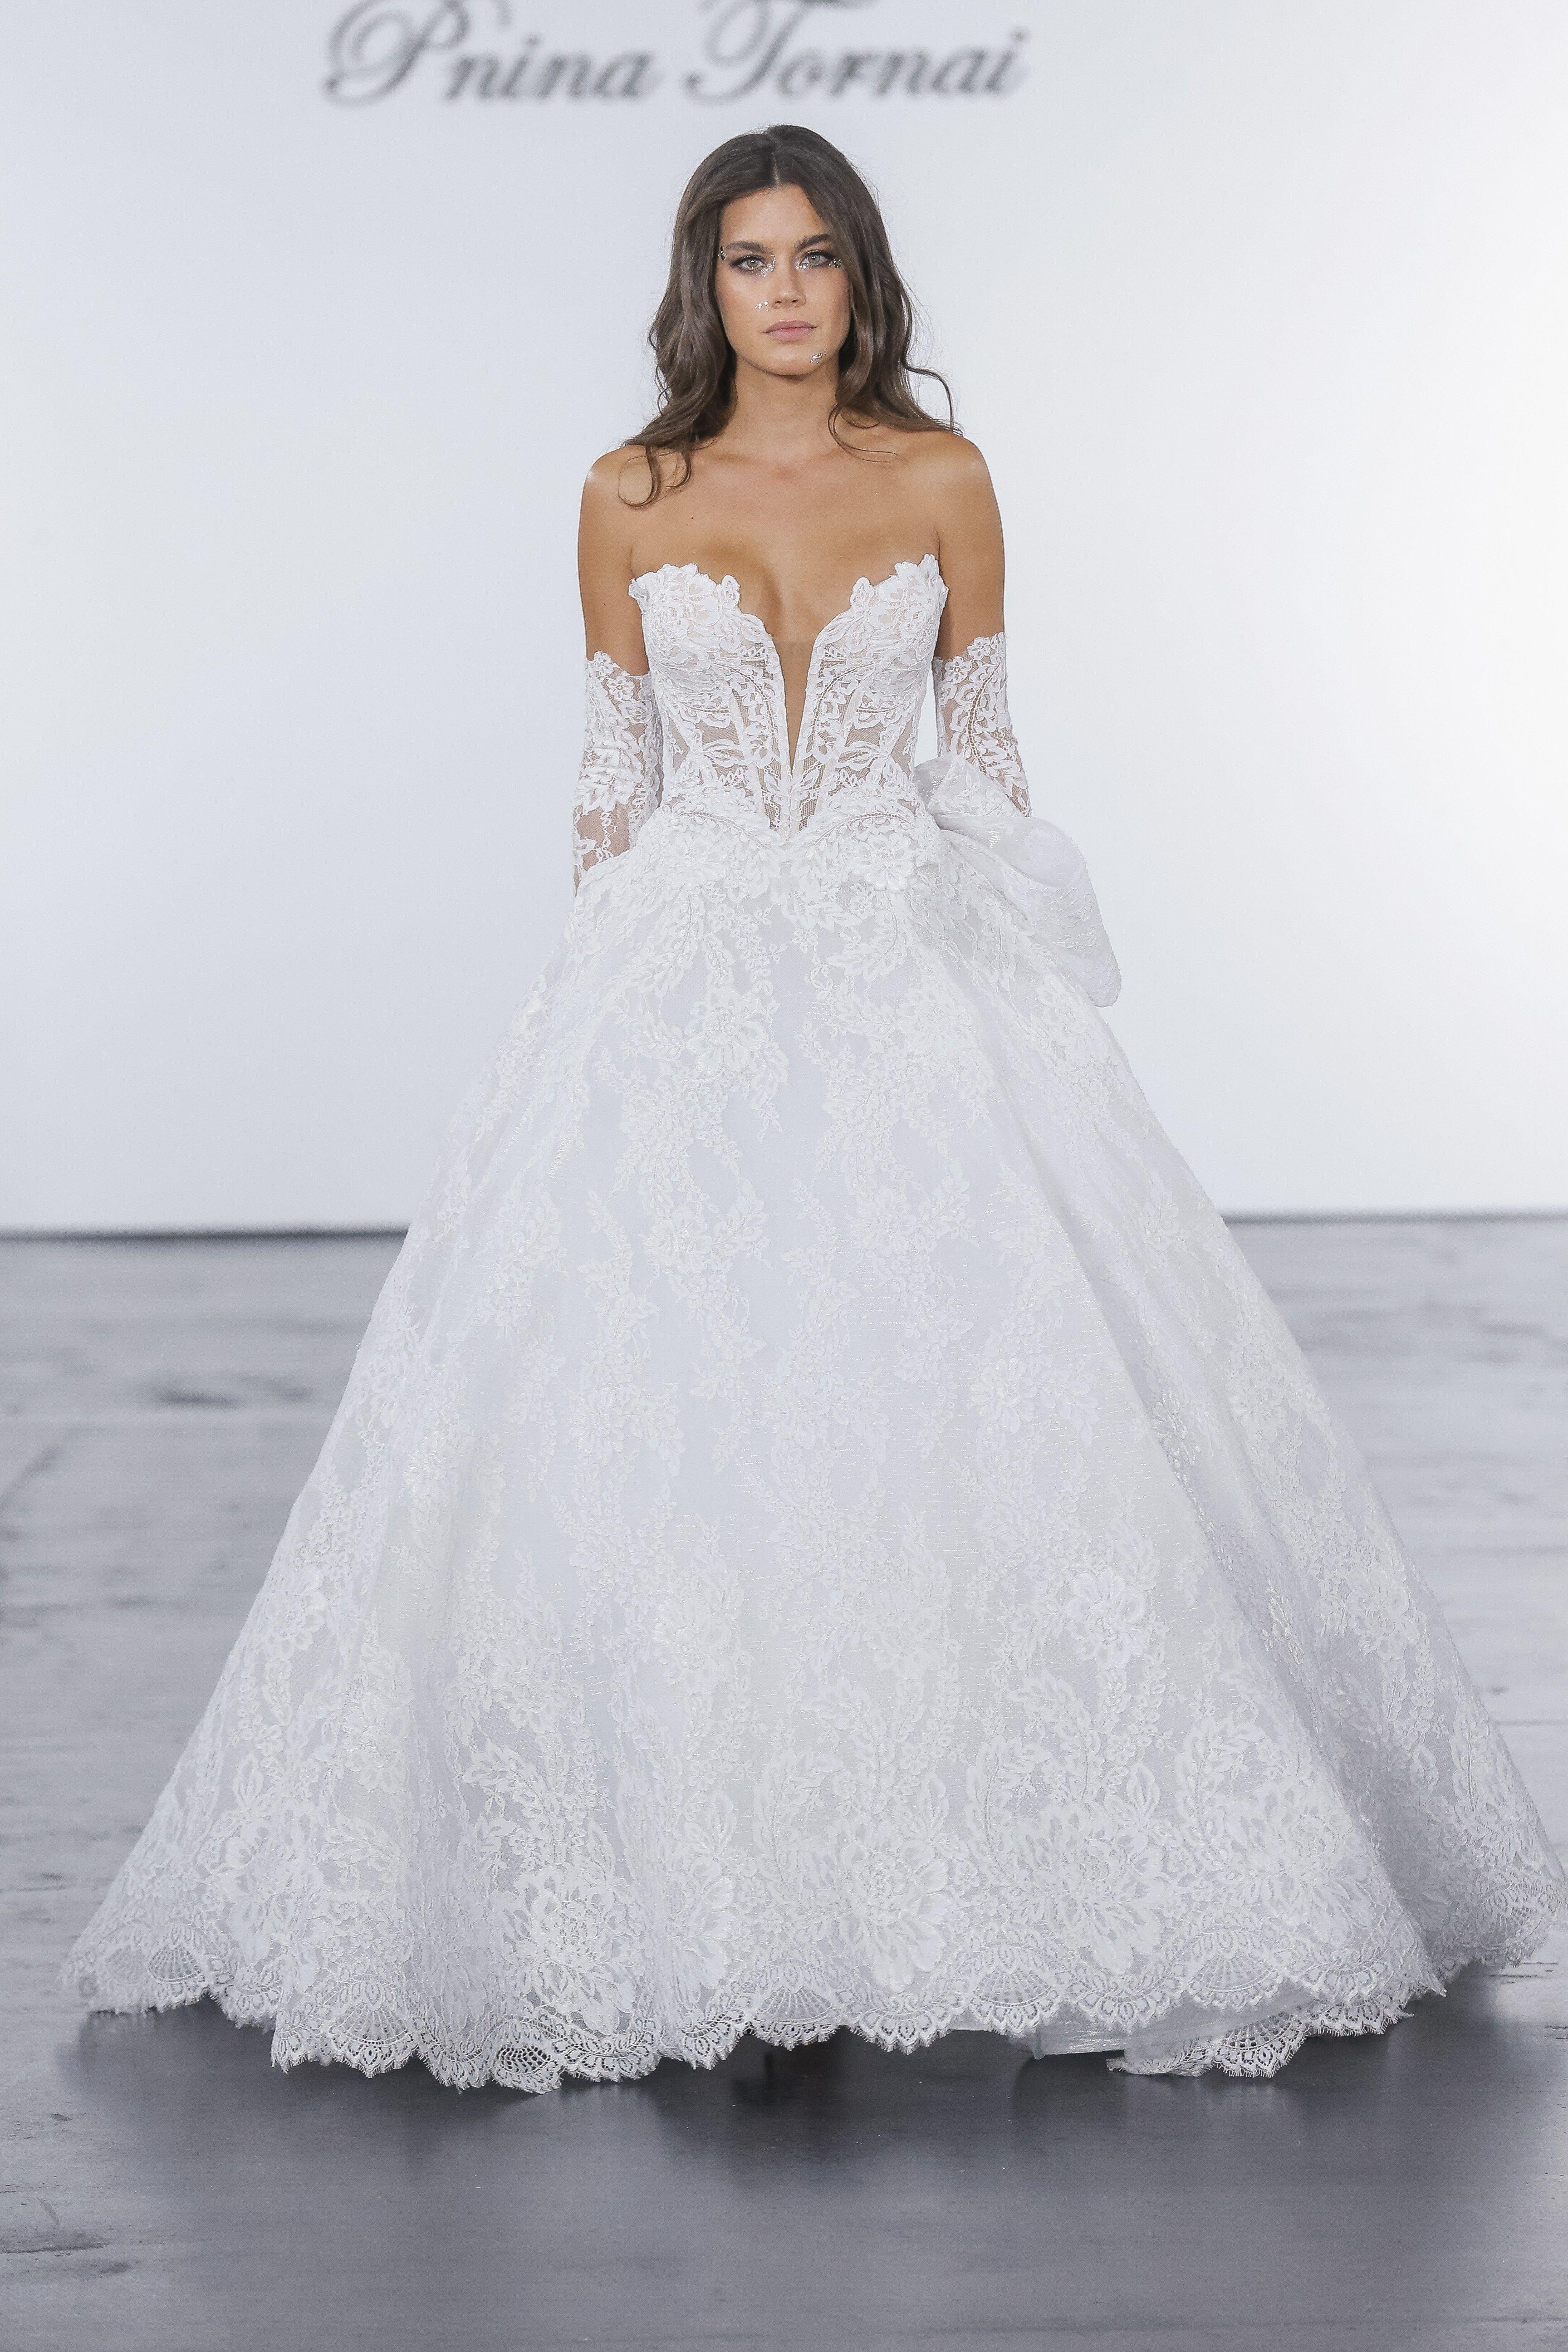 Großzügig Brautkleider Columbus Ohio Galerie - Brautkleider Ideen ...